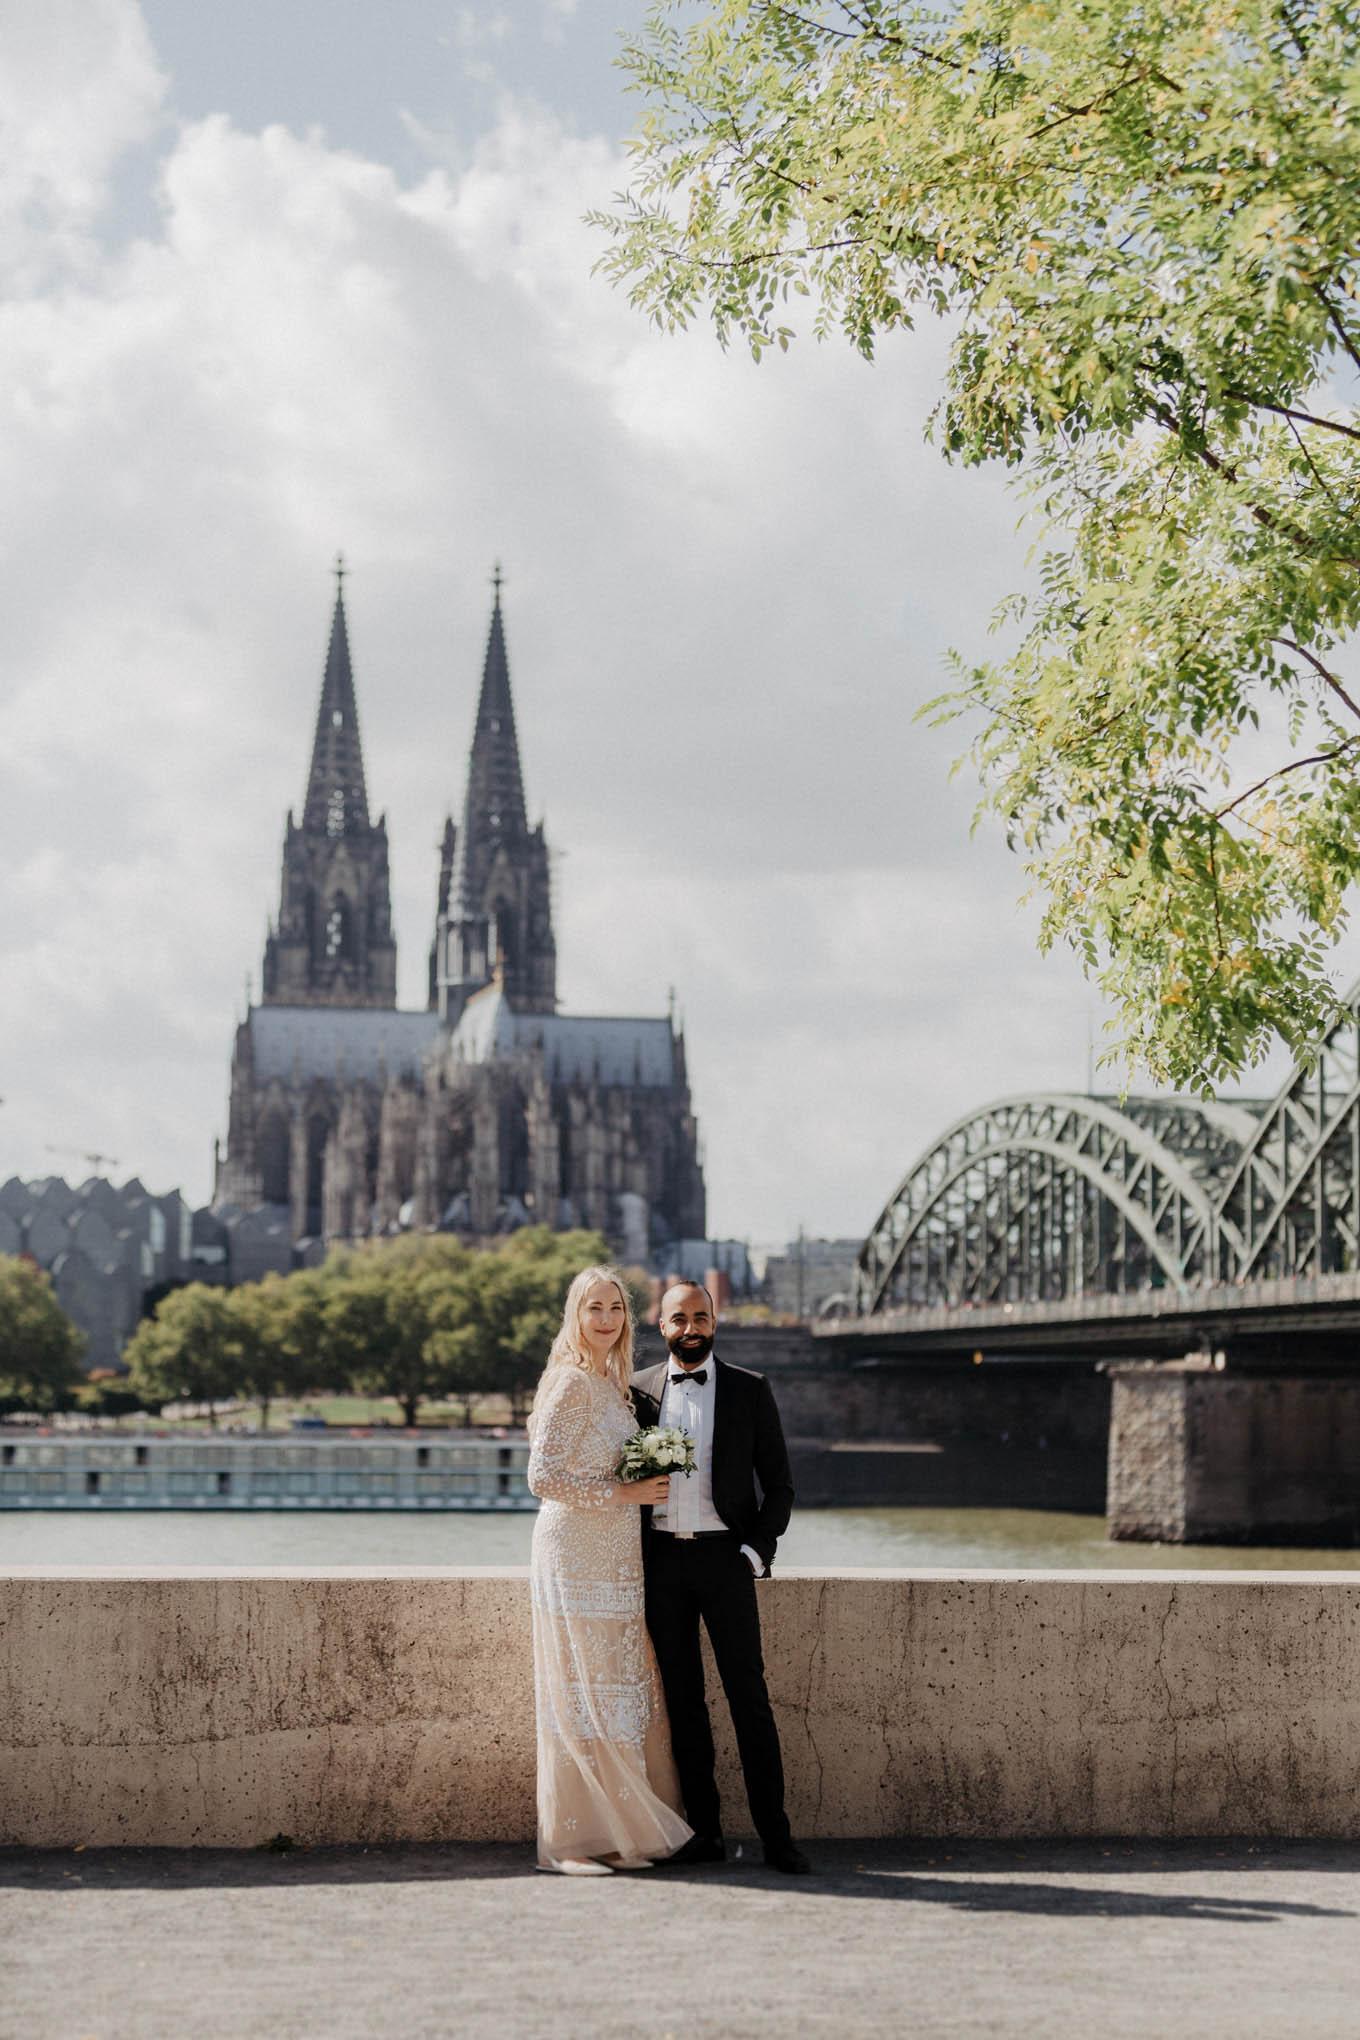 Brautpaarfoto mit Kölner Dom